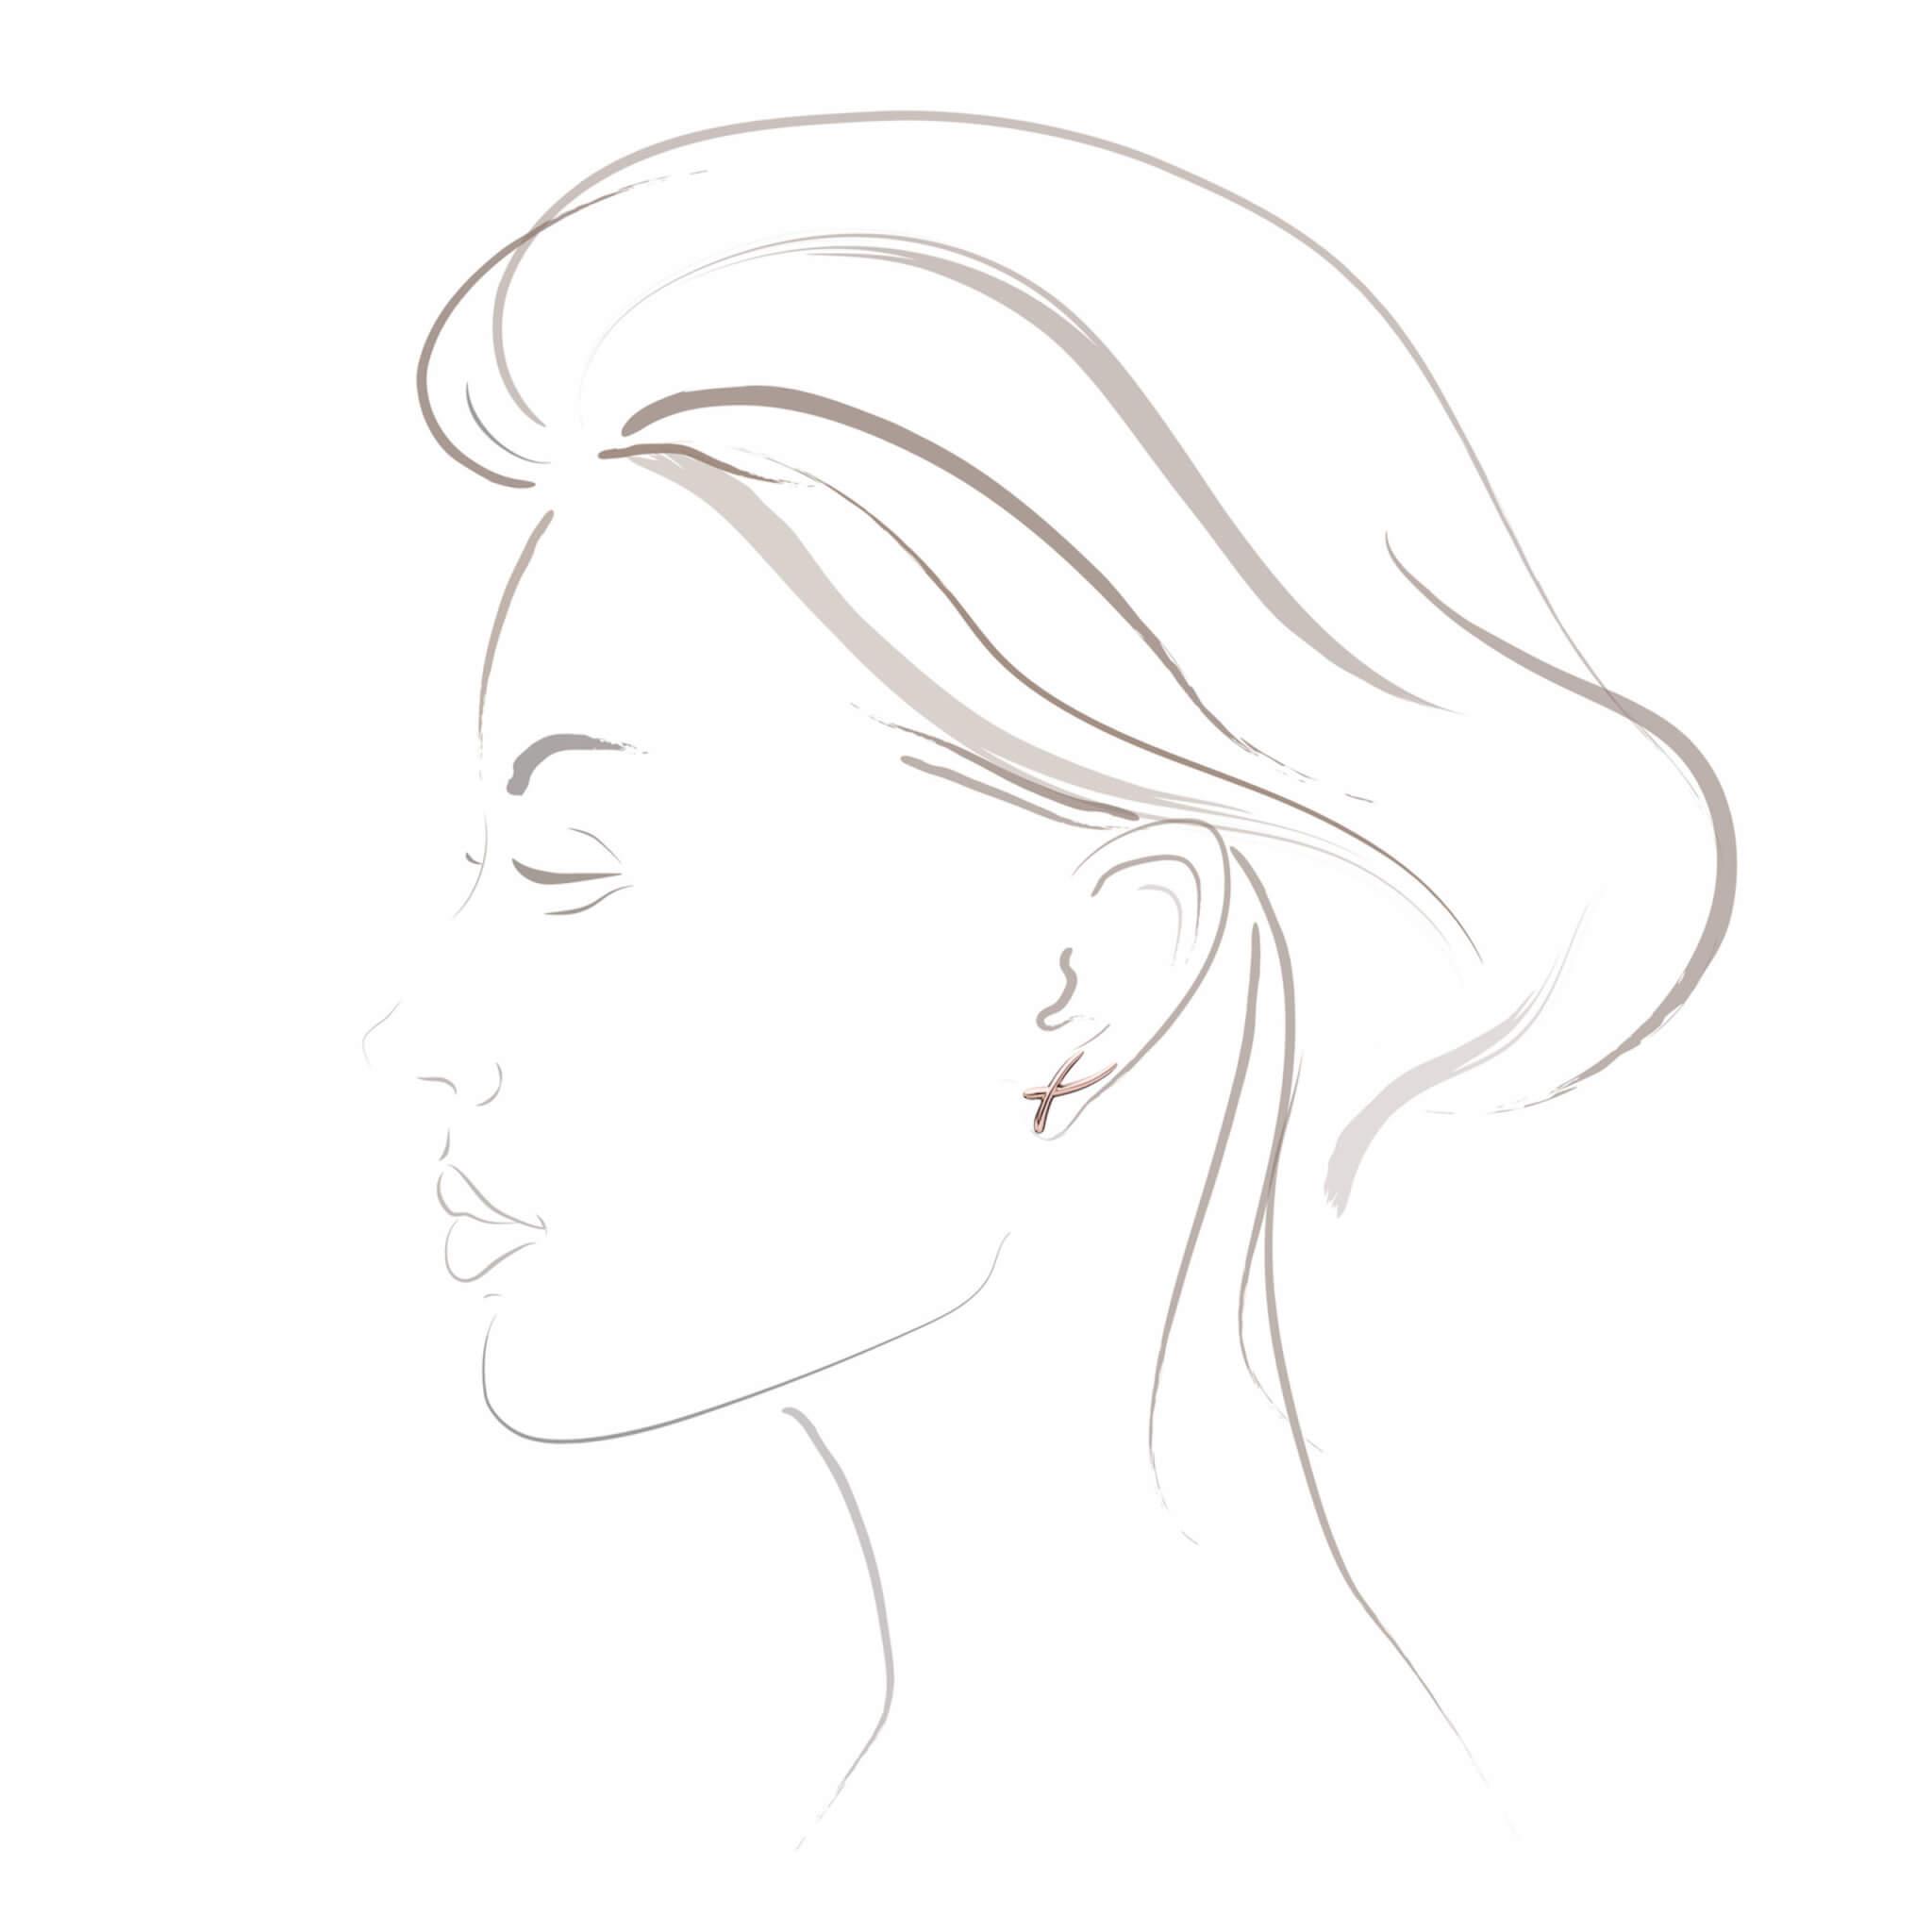 Duality boucle d'oreilles or